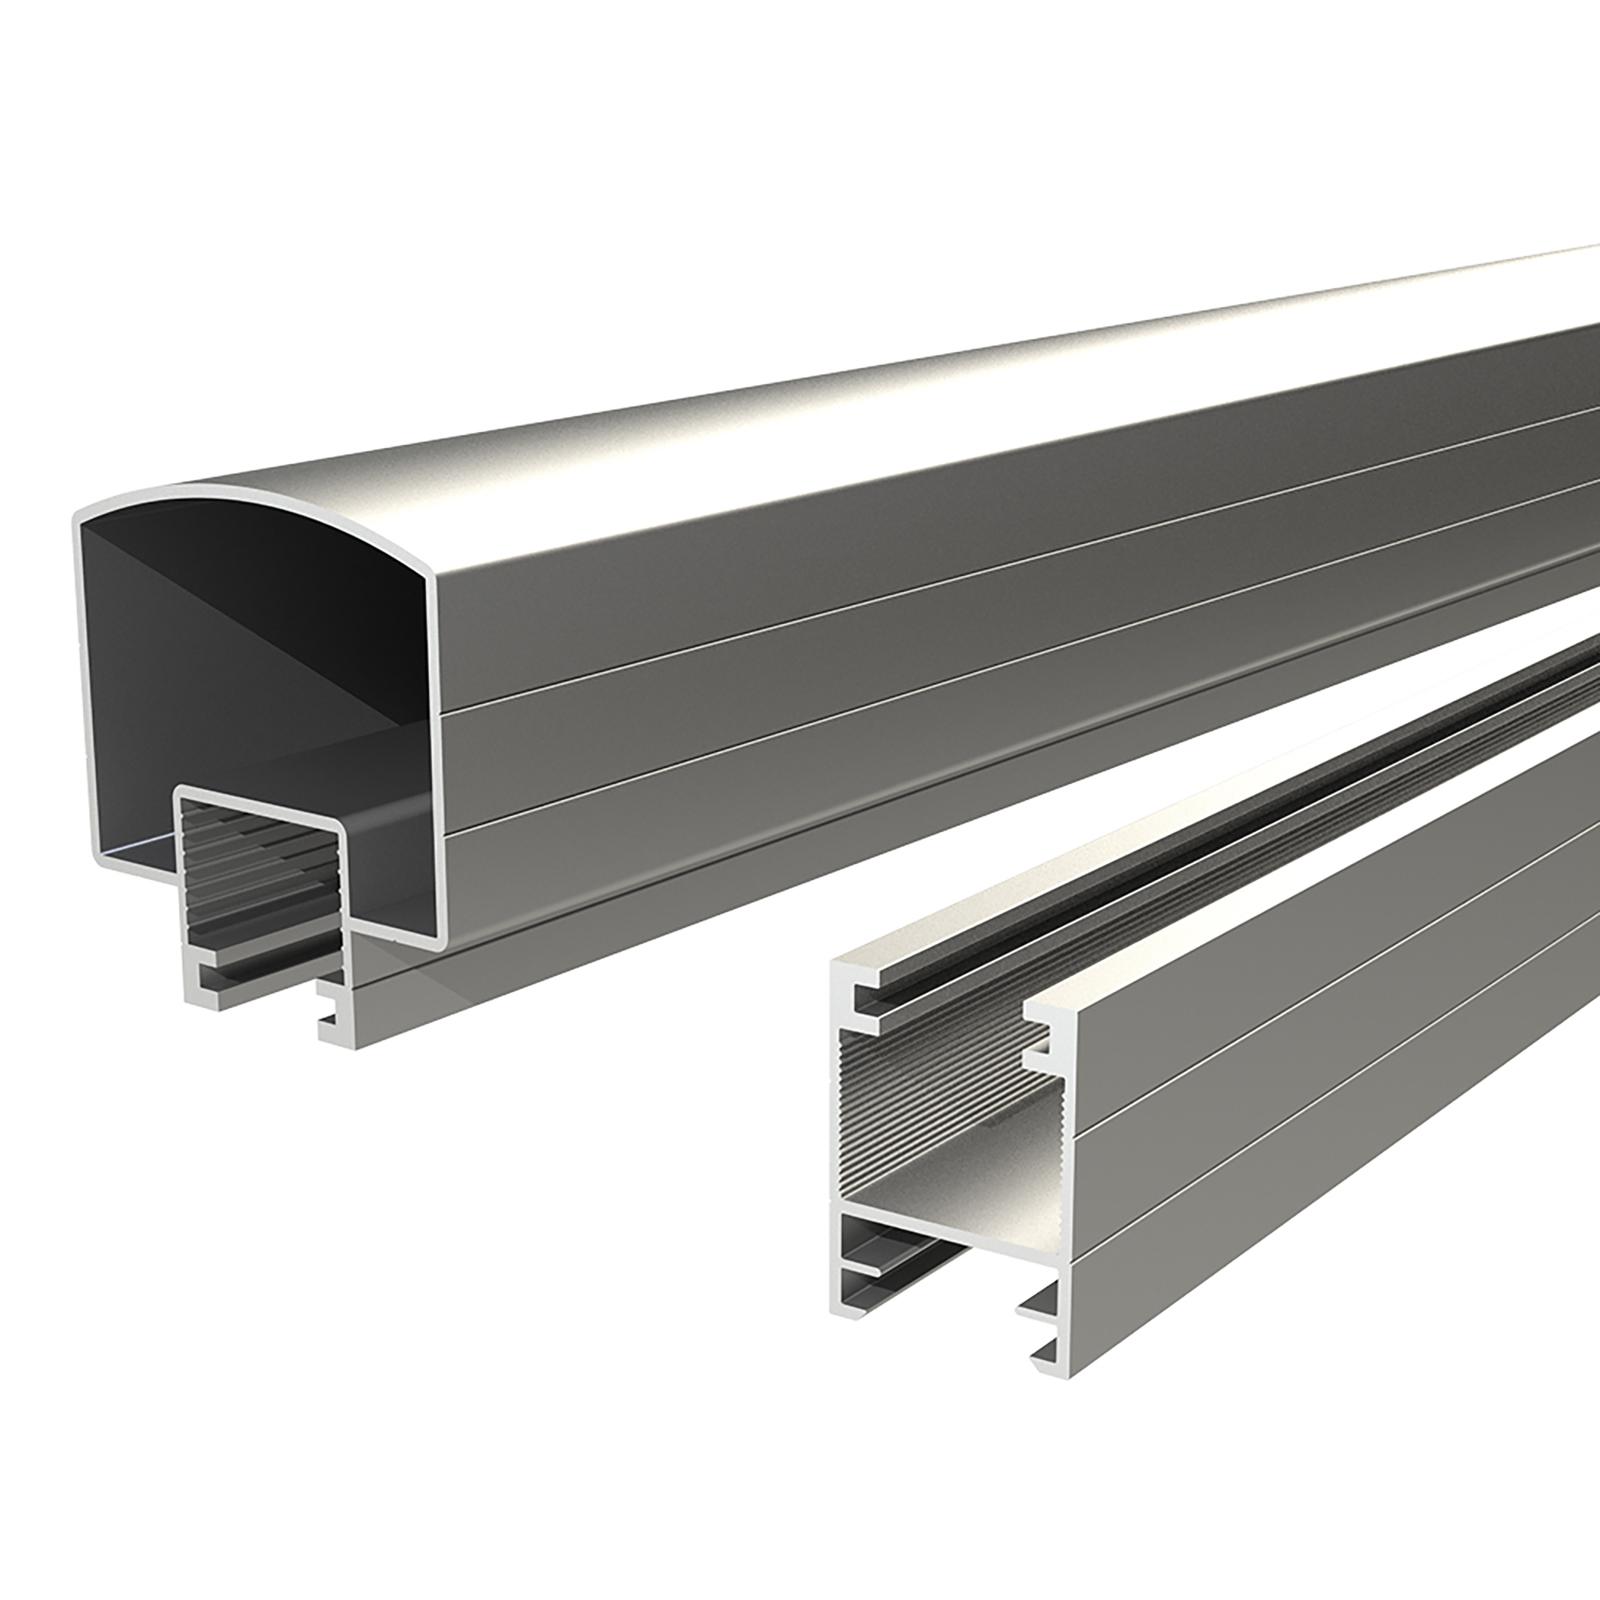 Peak Products 1200mm Silver Aluminium Balustrade Hand And Base Rail